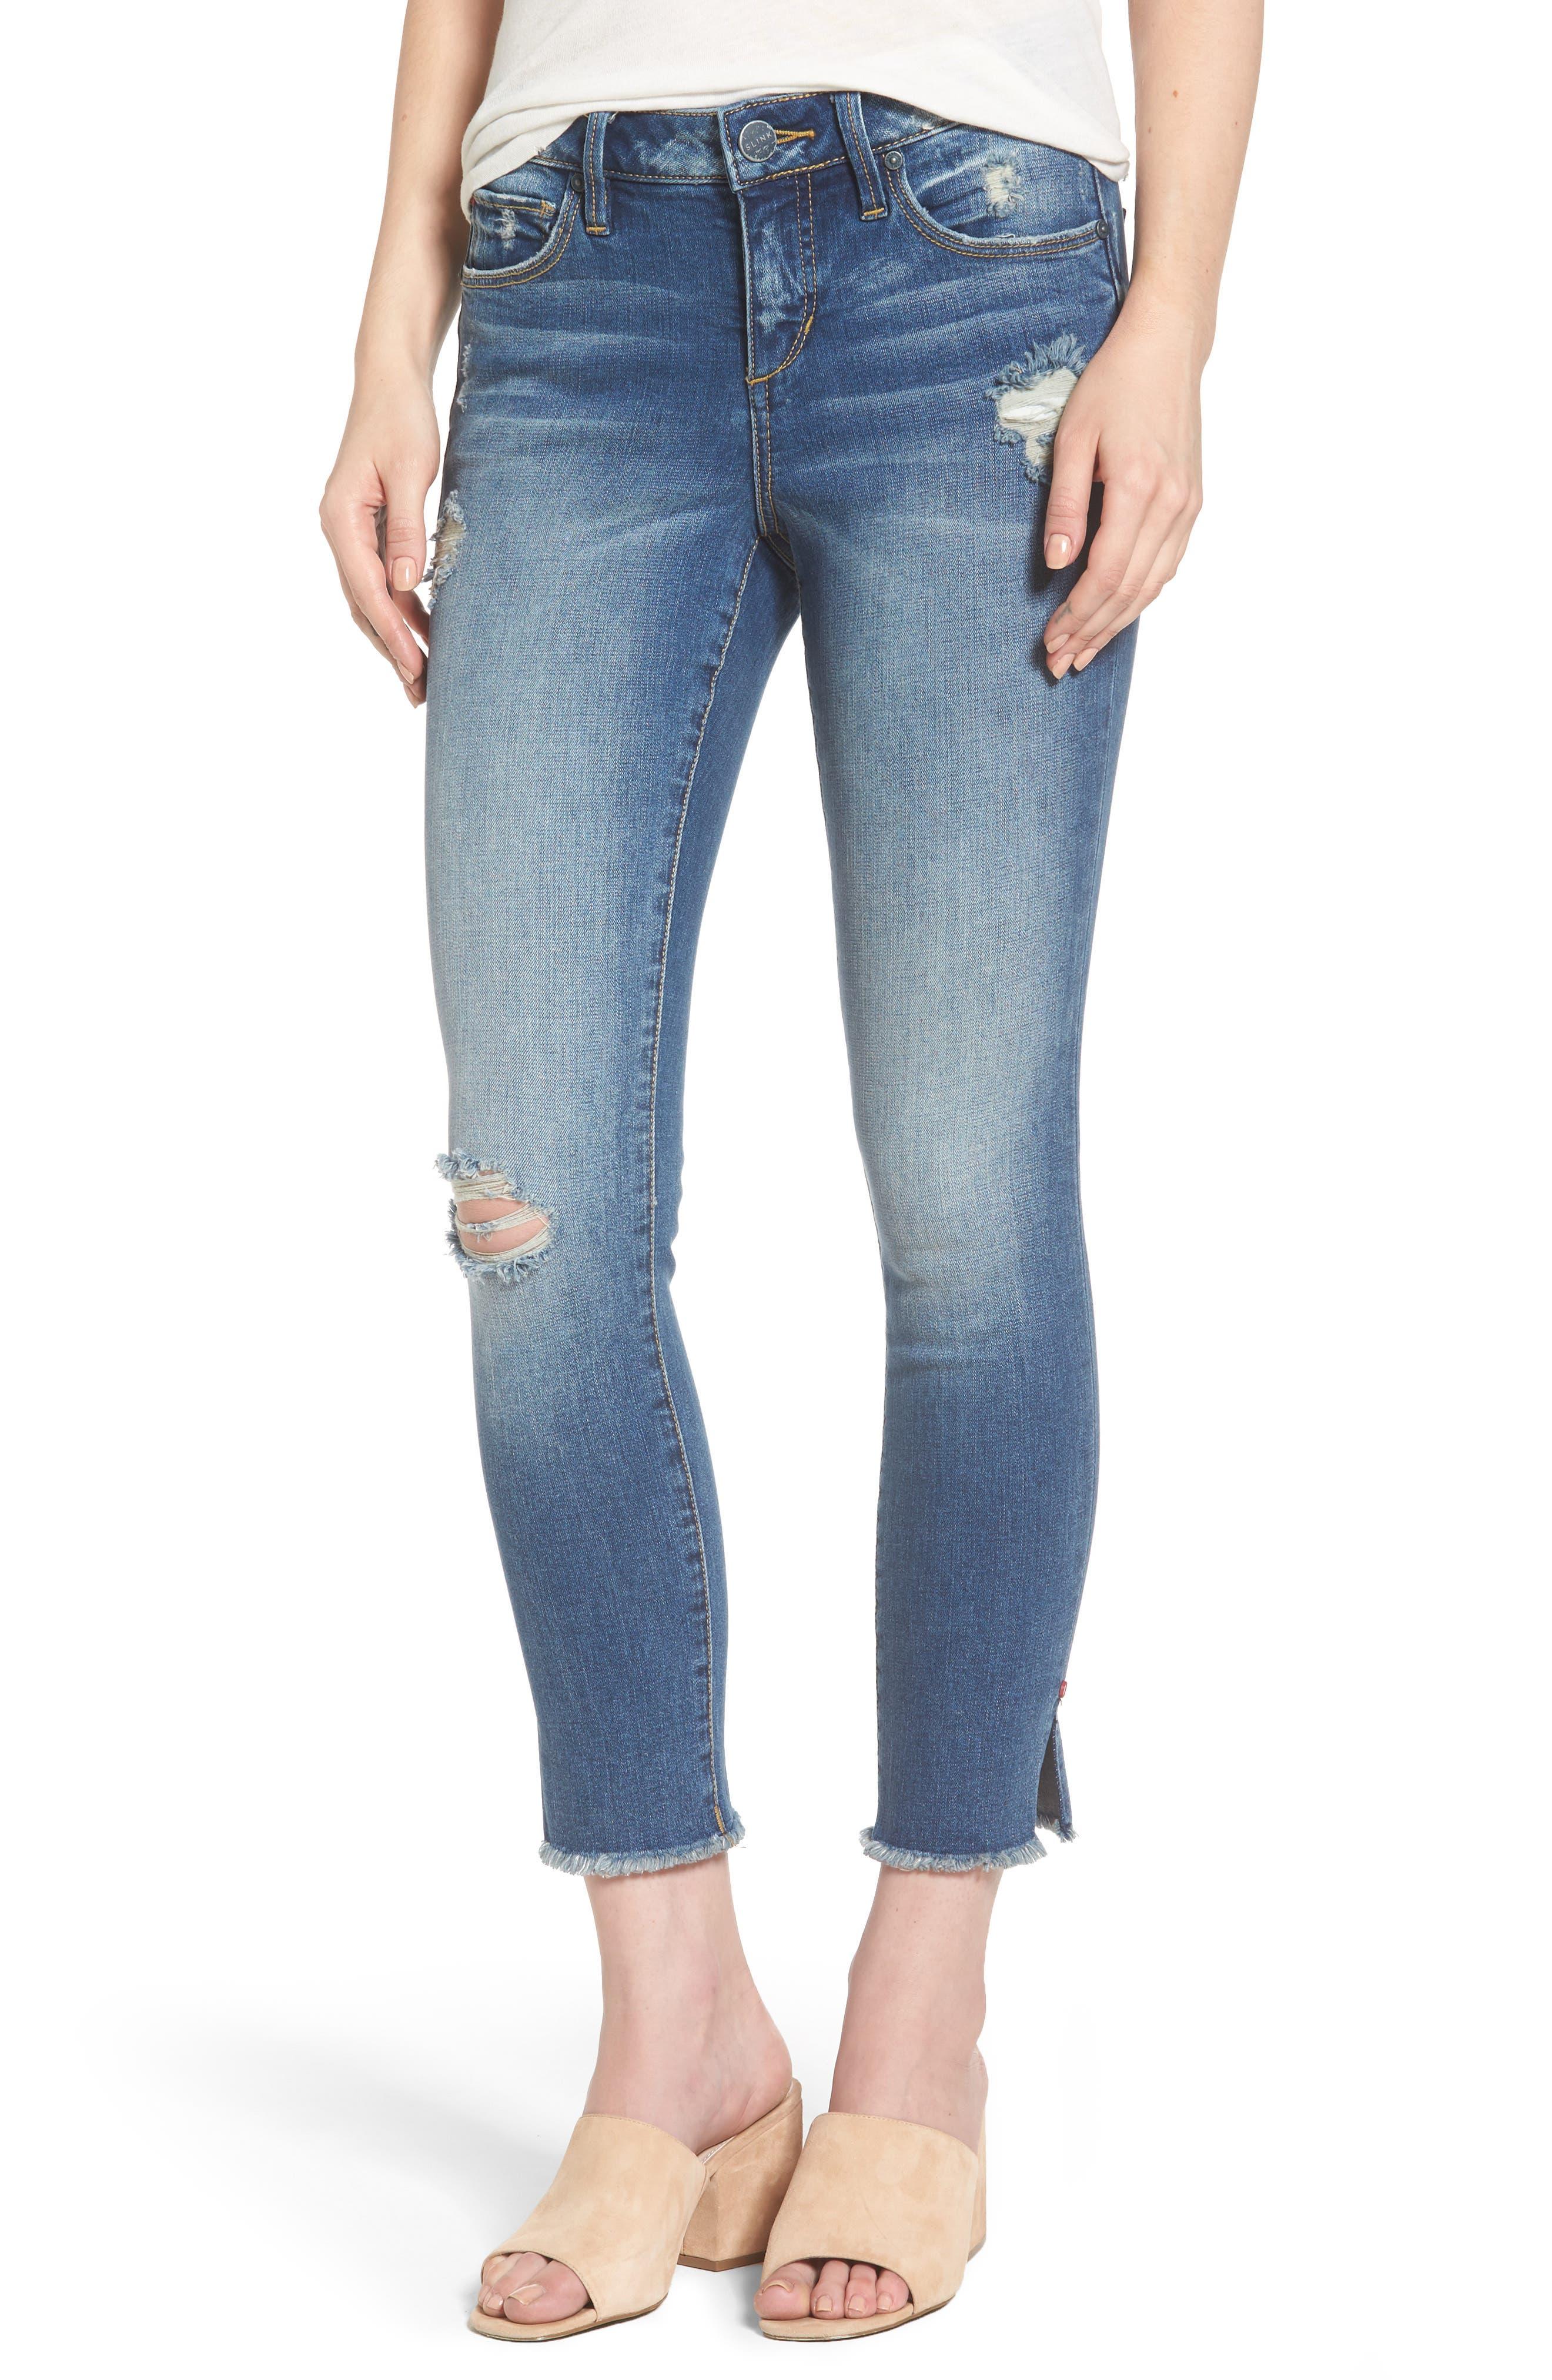 SLINK JEANS Frayed Hem Ripped Ankle Jeans